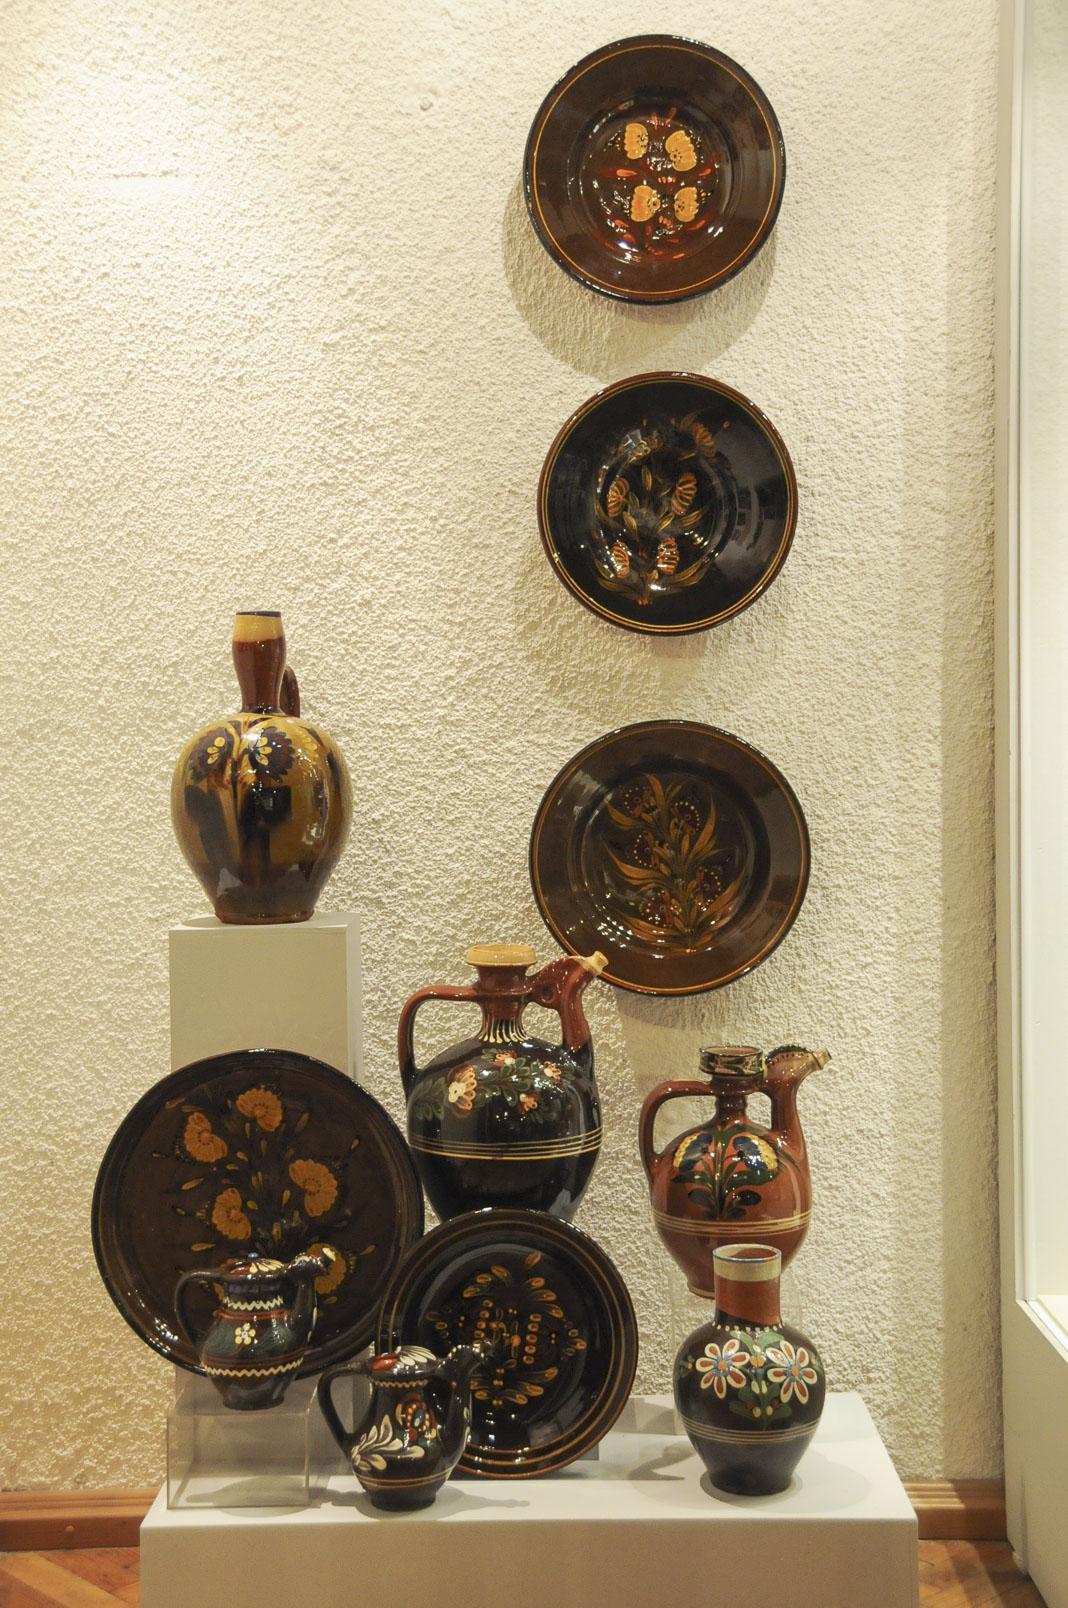 troyan-museum-cvetqta-na-zografa-15